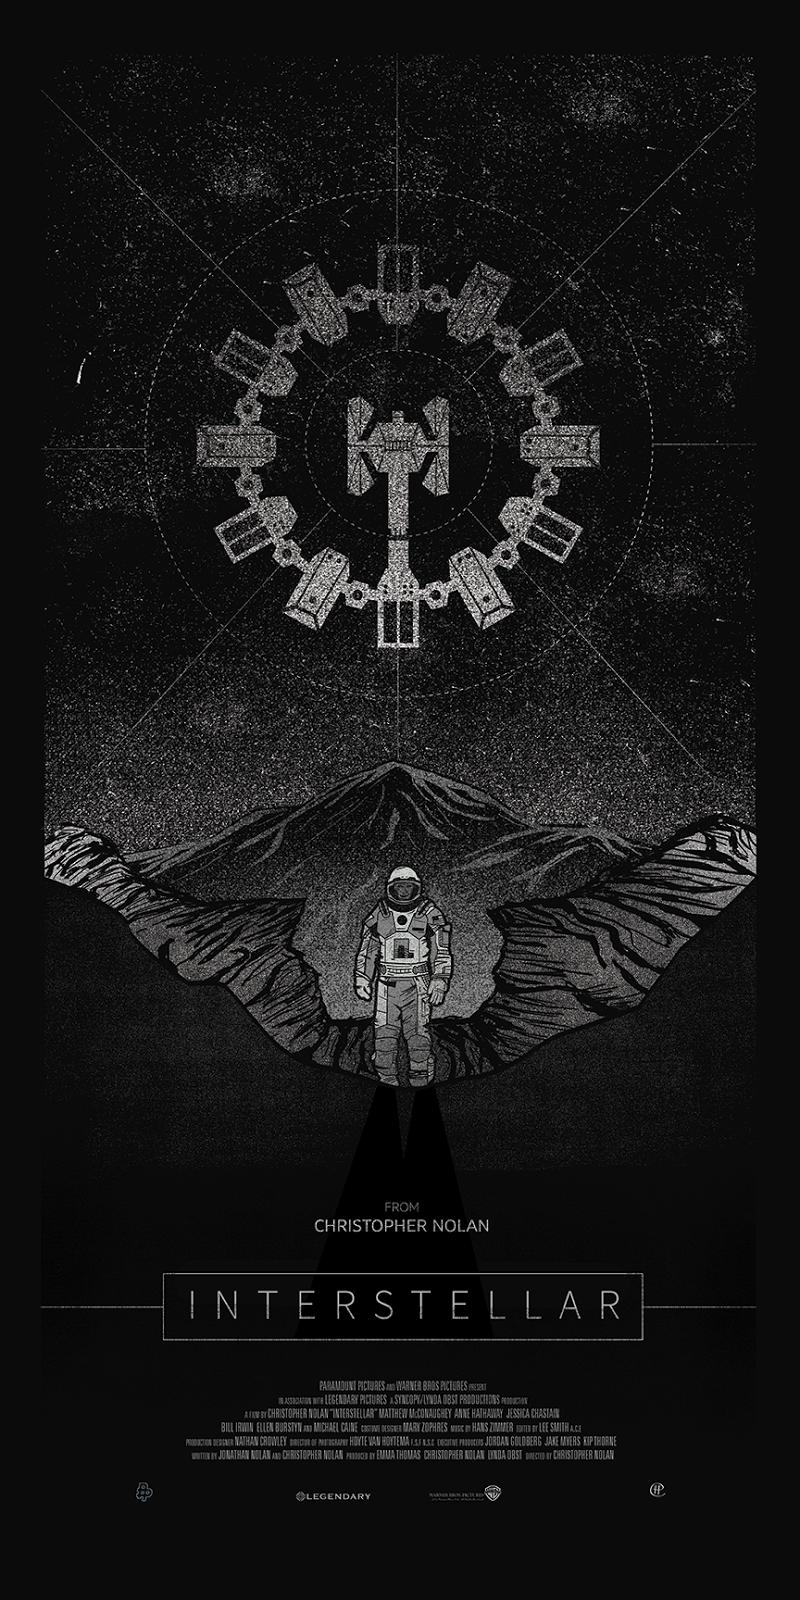 InterstellarbyHarlanElampng Nice Poster Cover - Beautifully designed interstellar posters james fletcher